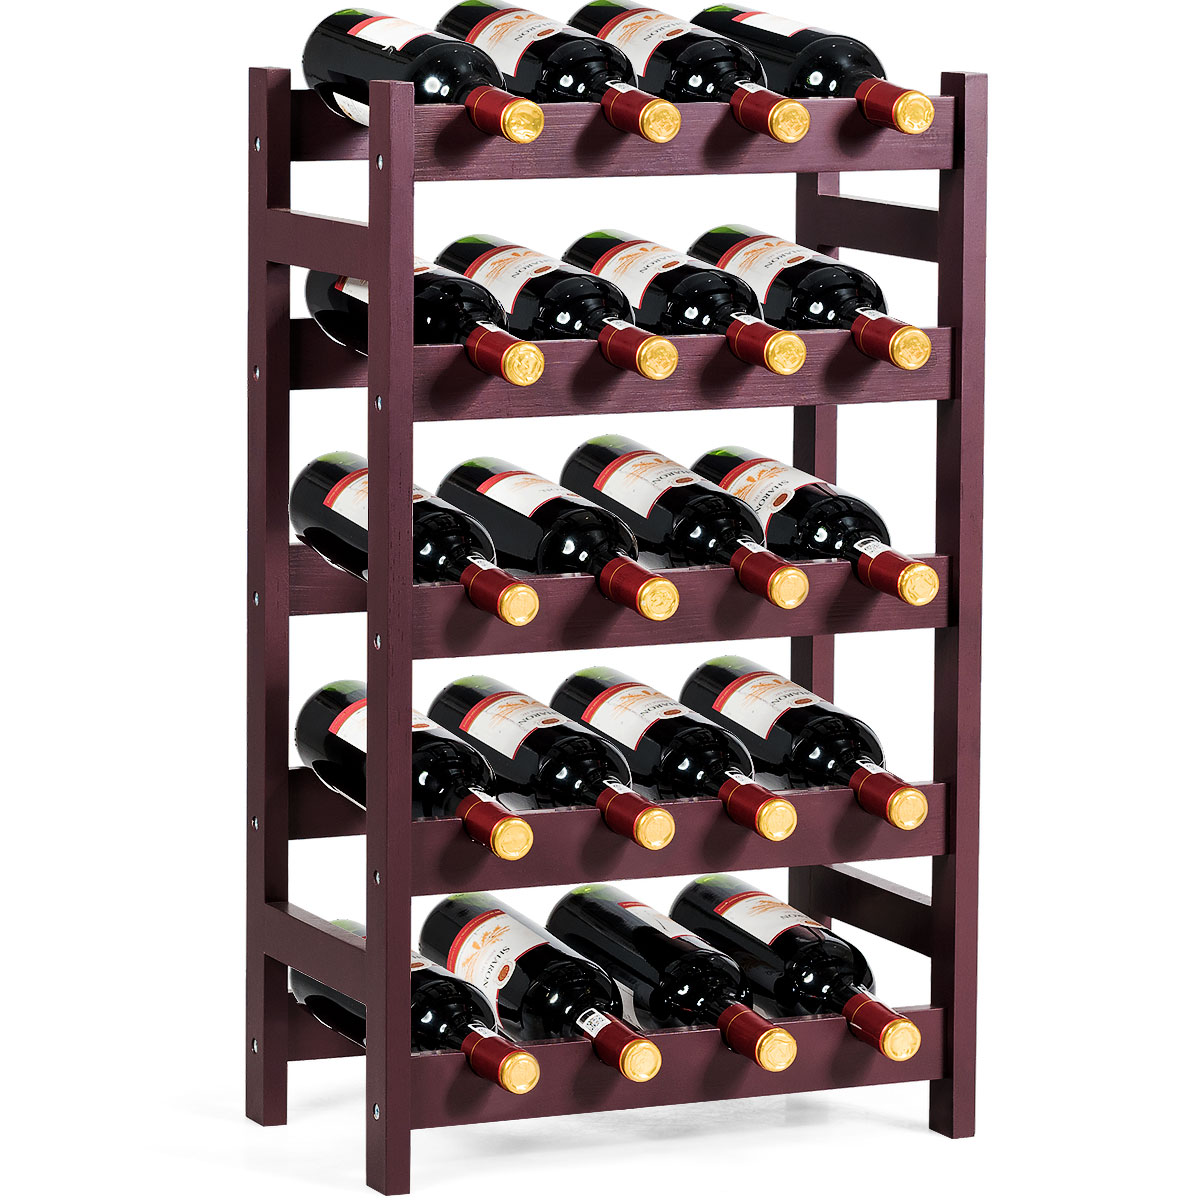 8-Bottle Riipoo 8-Bottle Wine Rack Free Standing and Countertop Stackable Wine Storage Shelf 2-Tier Nature Bamboo Wine Display Rack